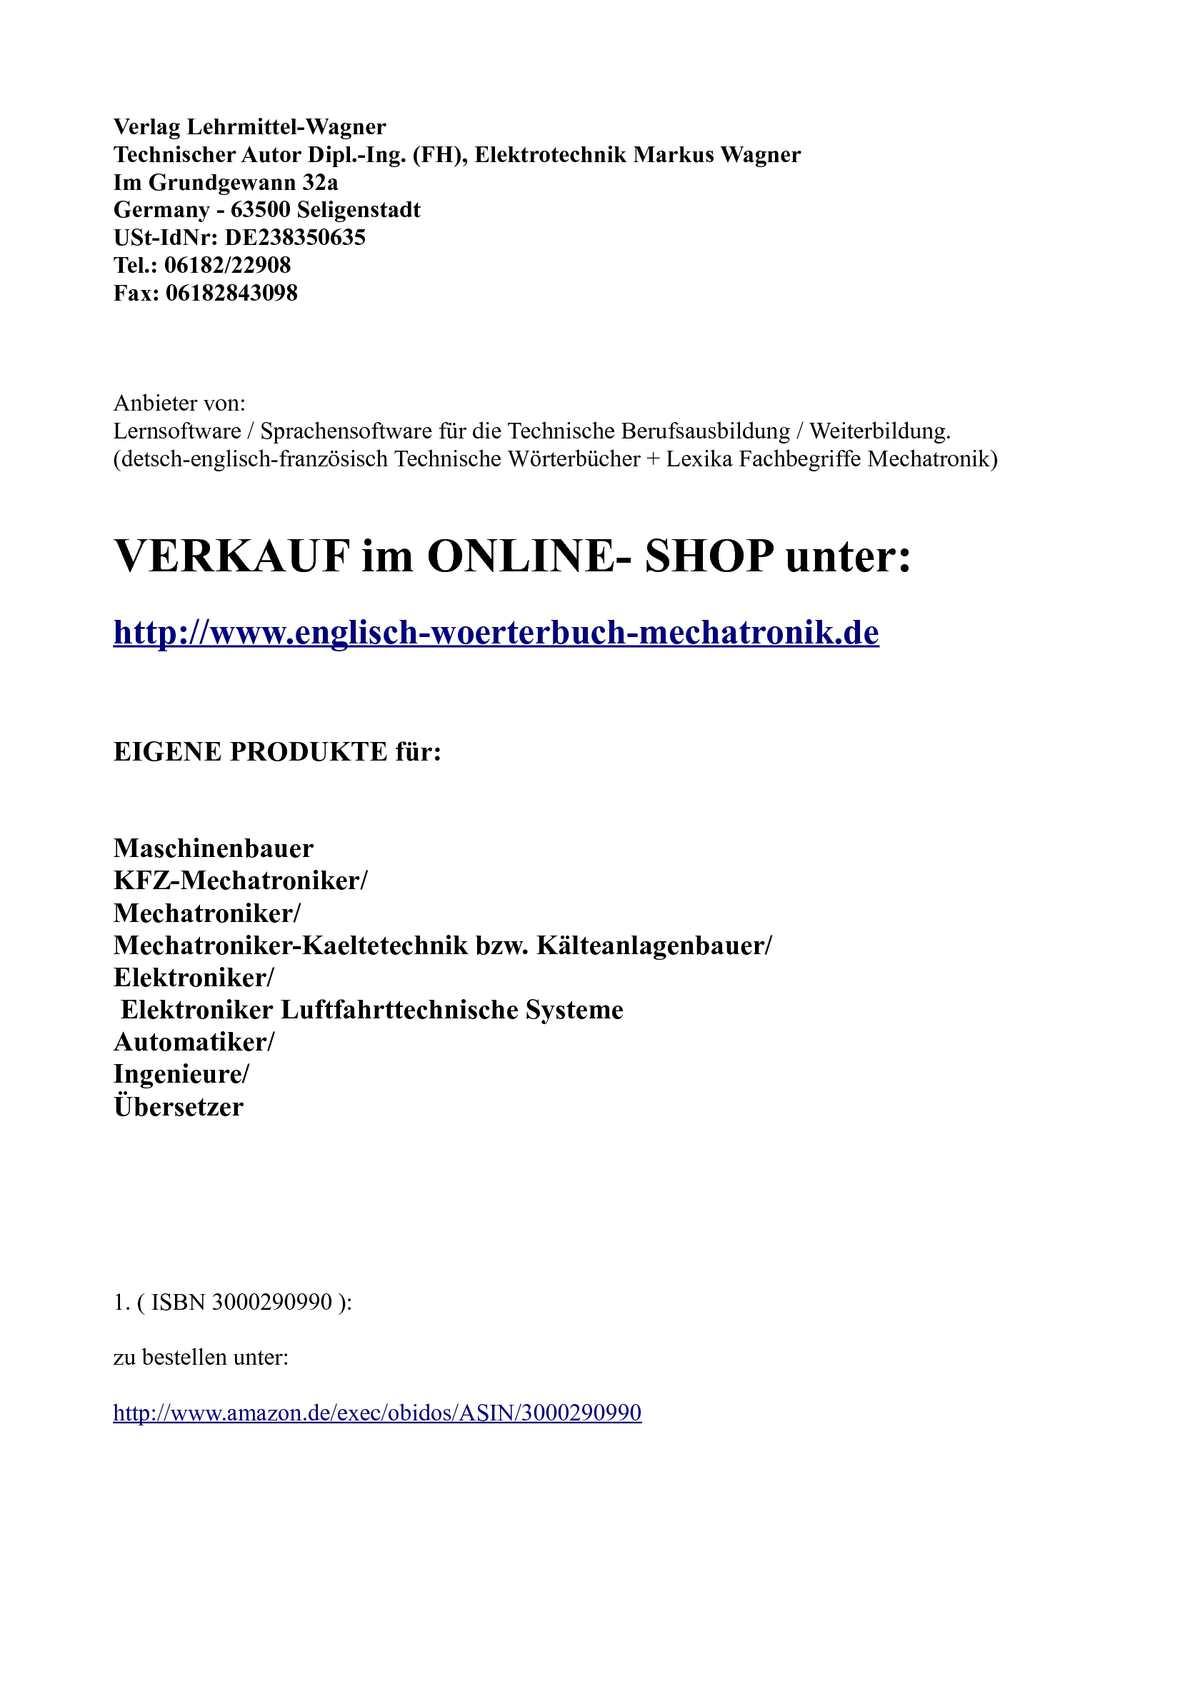 Calaméo - Anbieter Verlag Lehrmittel Wagner: Leseprobe deutsch ...